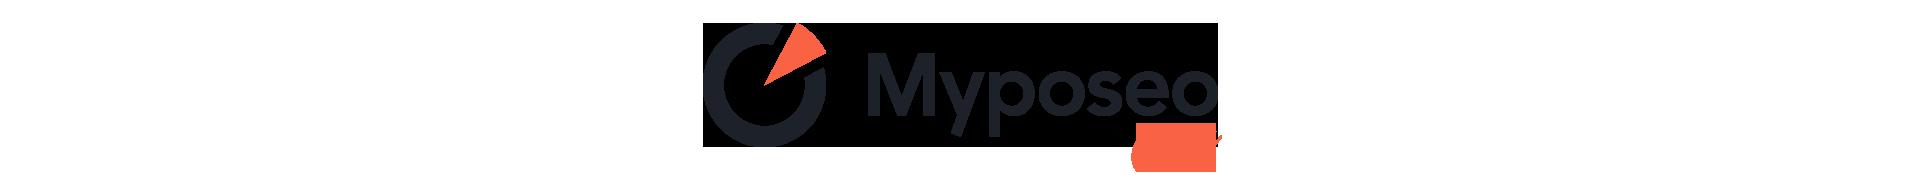 Myposeo blog